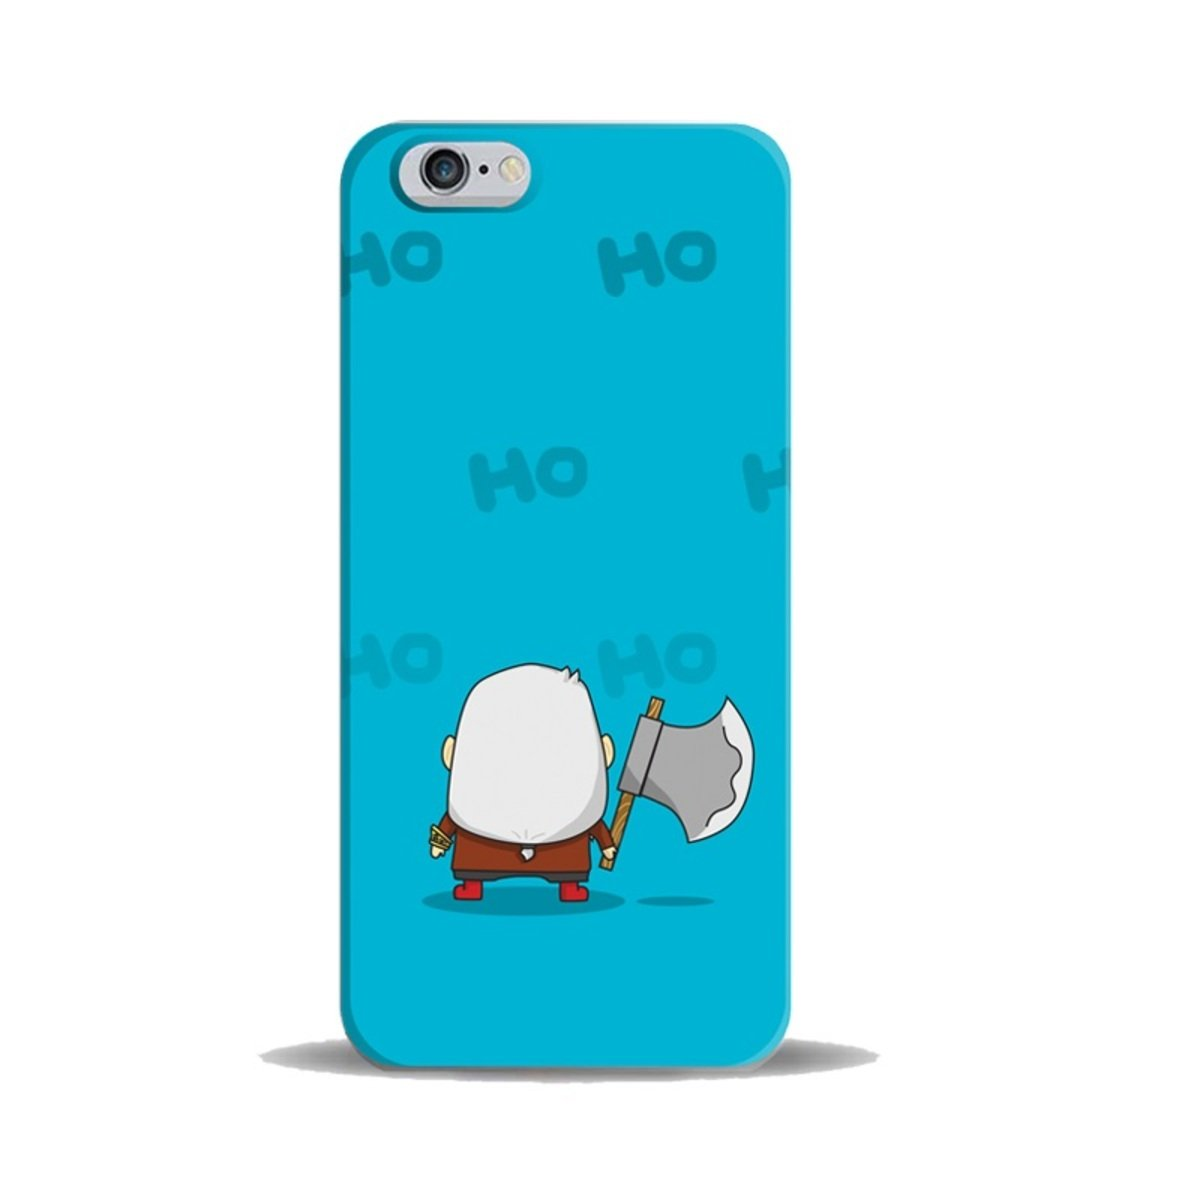 "iPhase - iPhone 6 (4.7"") 手機膠殼電話保護套 4.7寸 (Holden) (另有適合iPhone 6 Plus 5.5寸型號)"